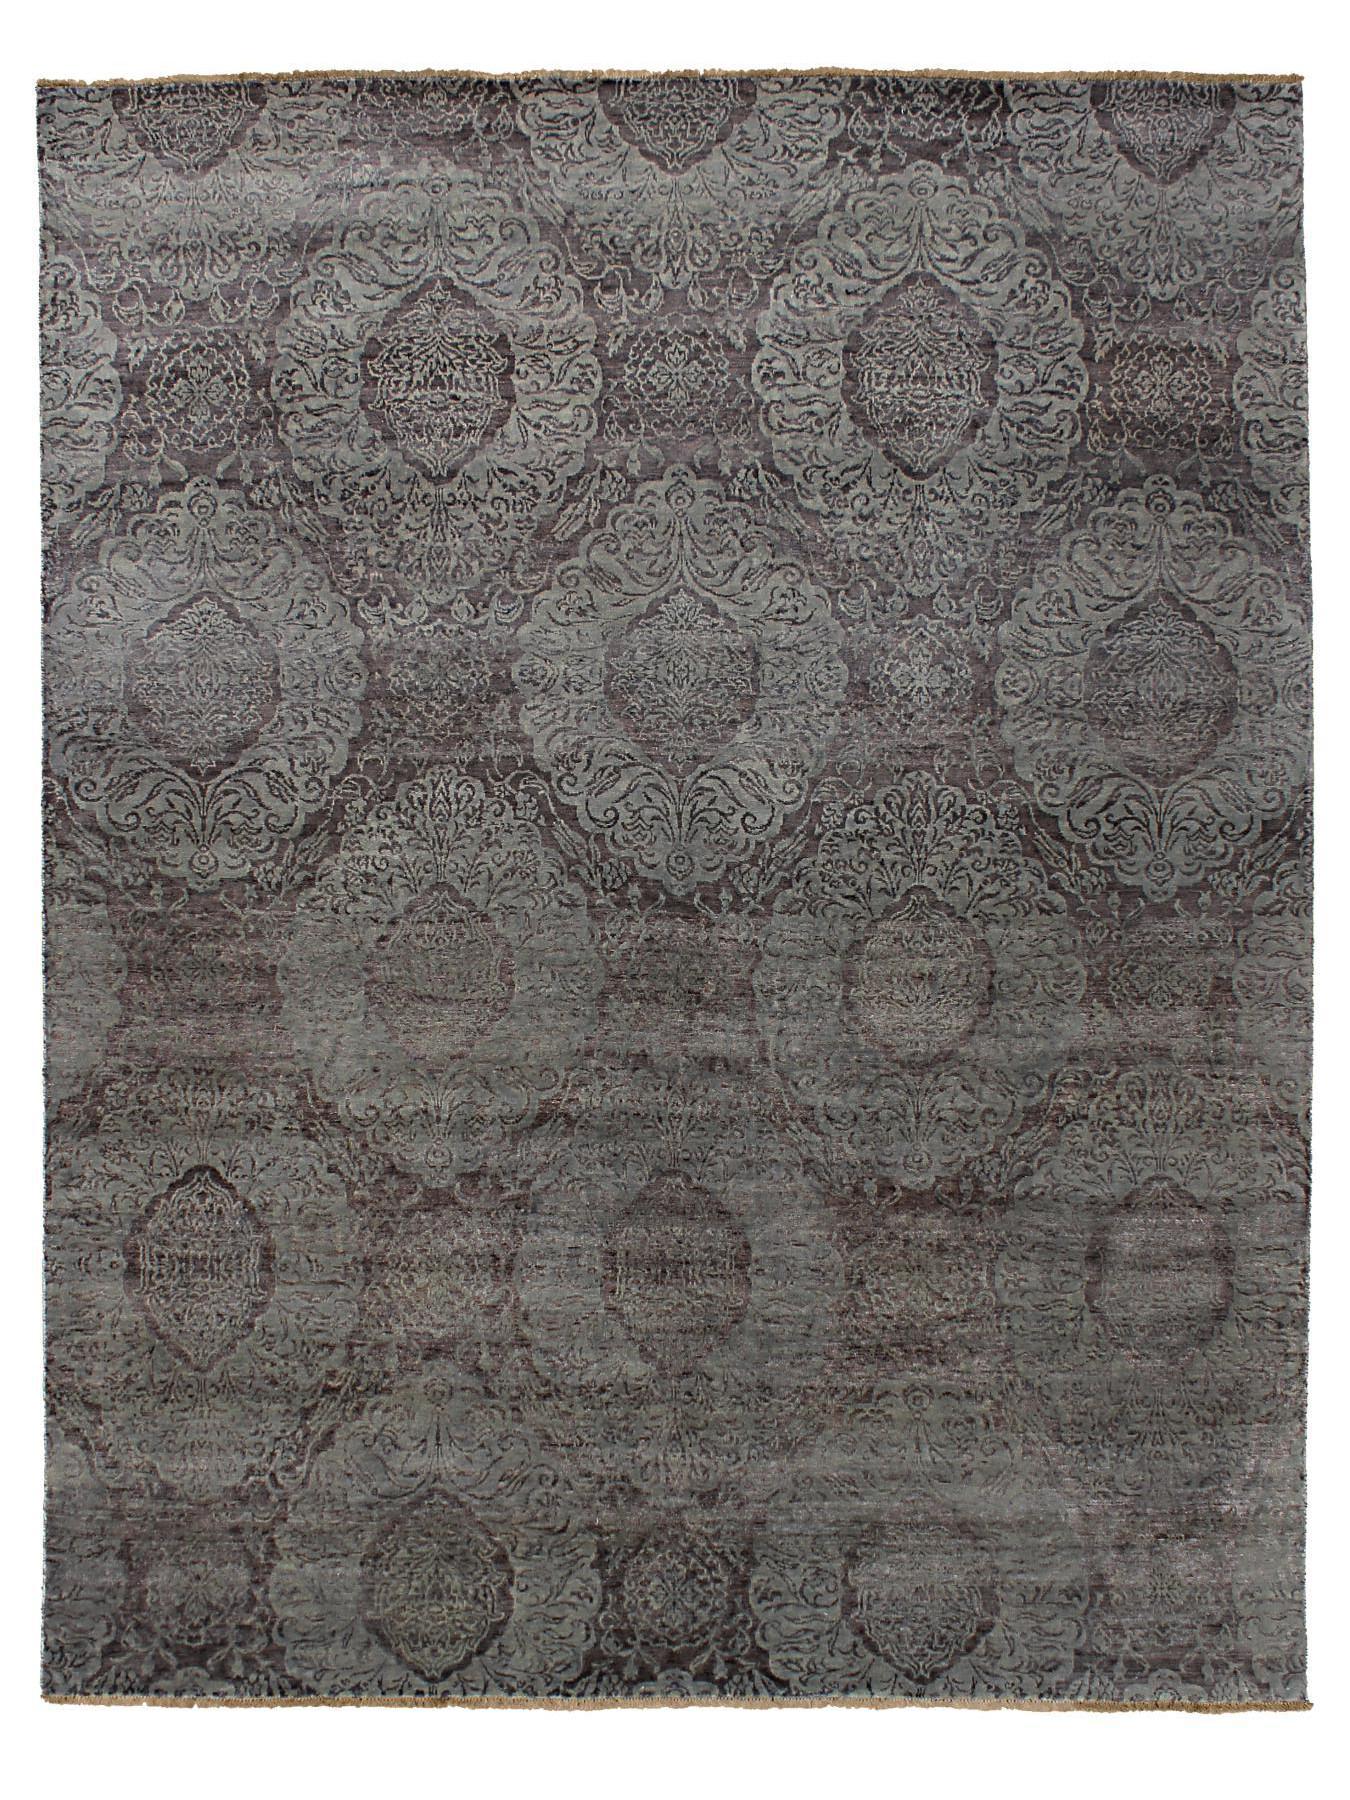 Luxury carpets - Damask-AL-282 F-33/B-7